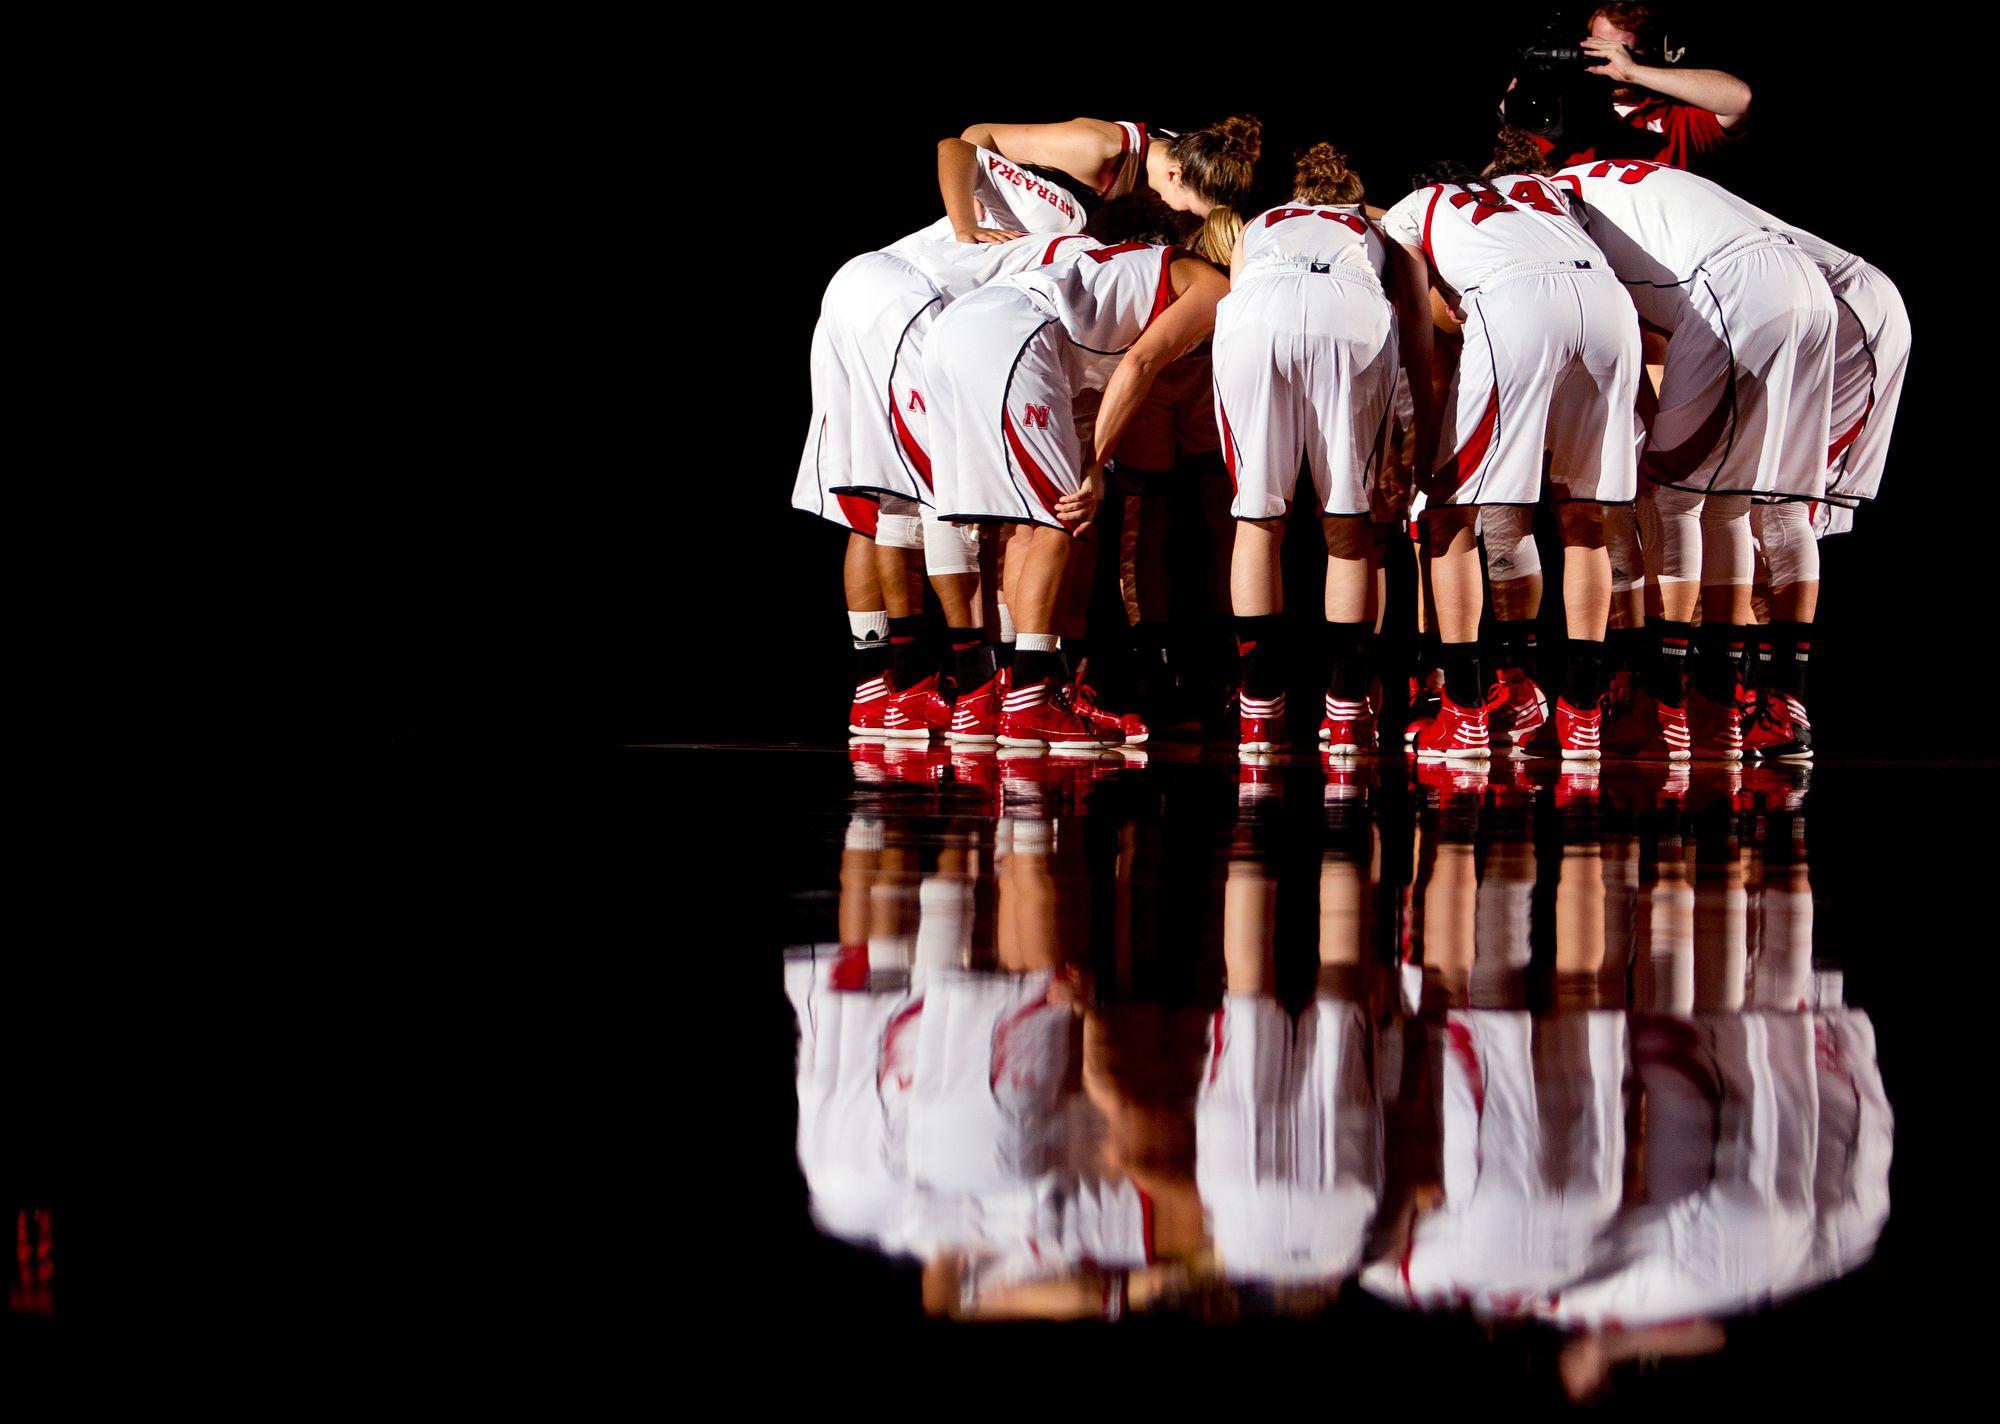 The Nebraska women's basketball team meets in a huddle